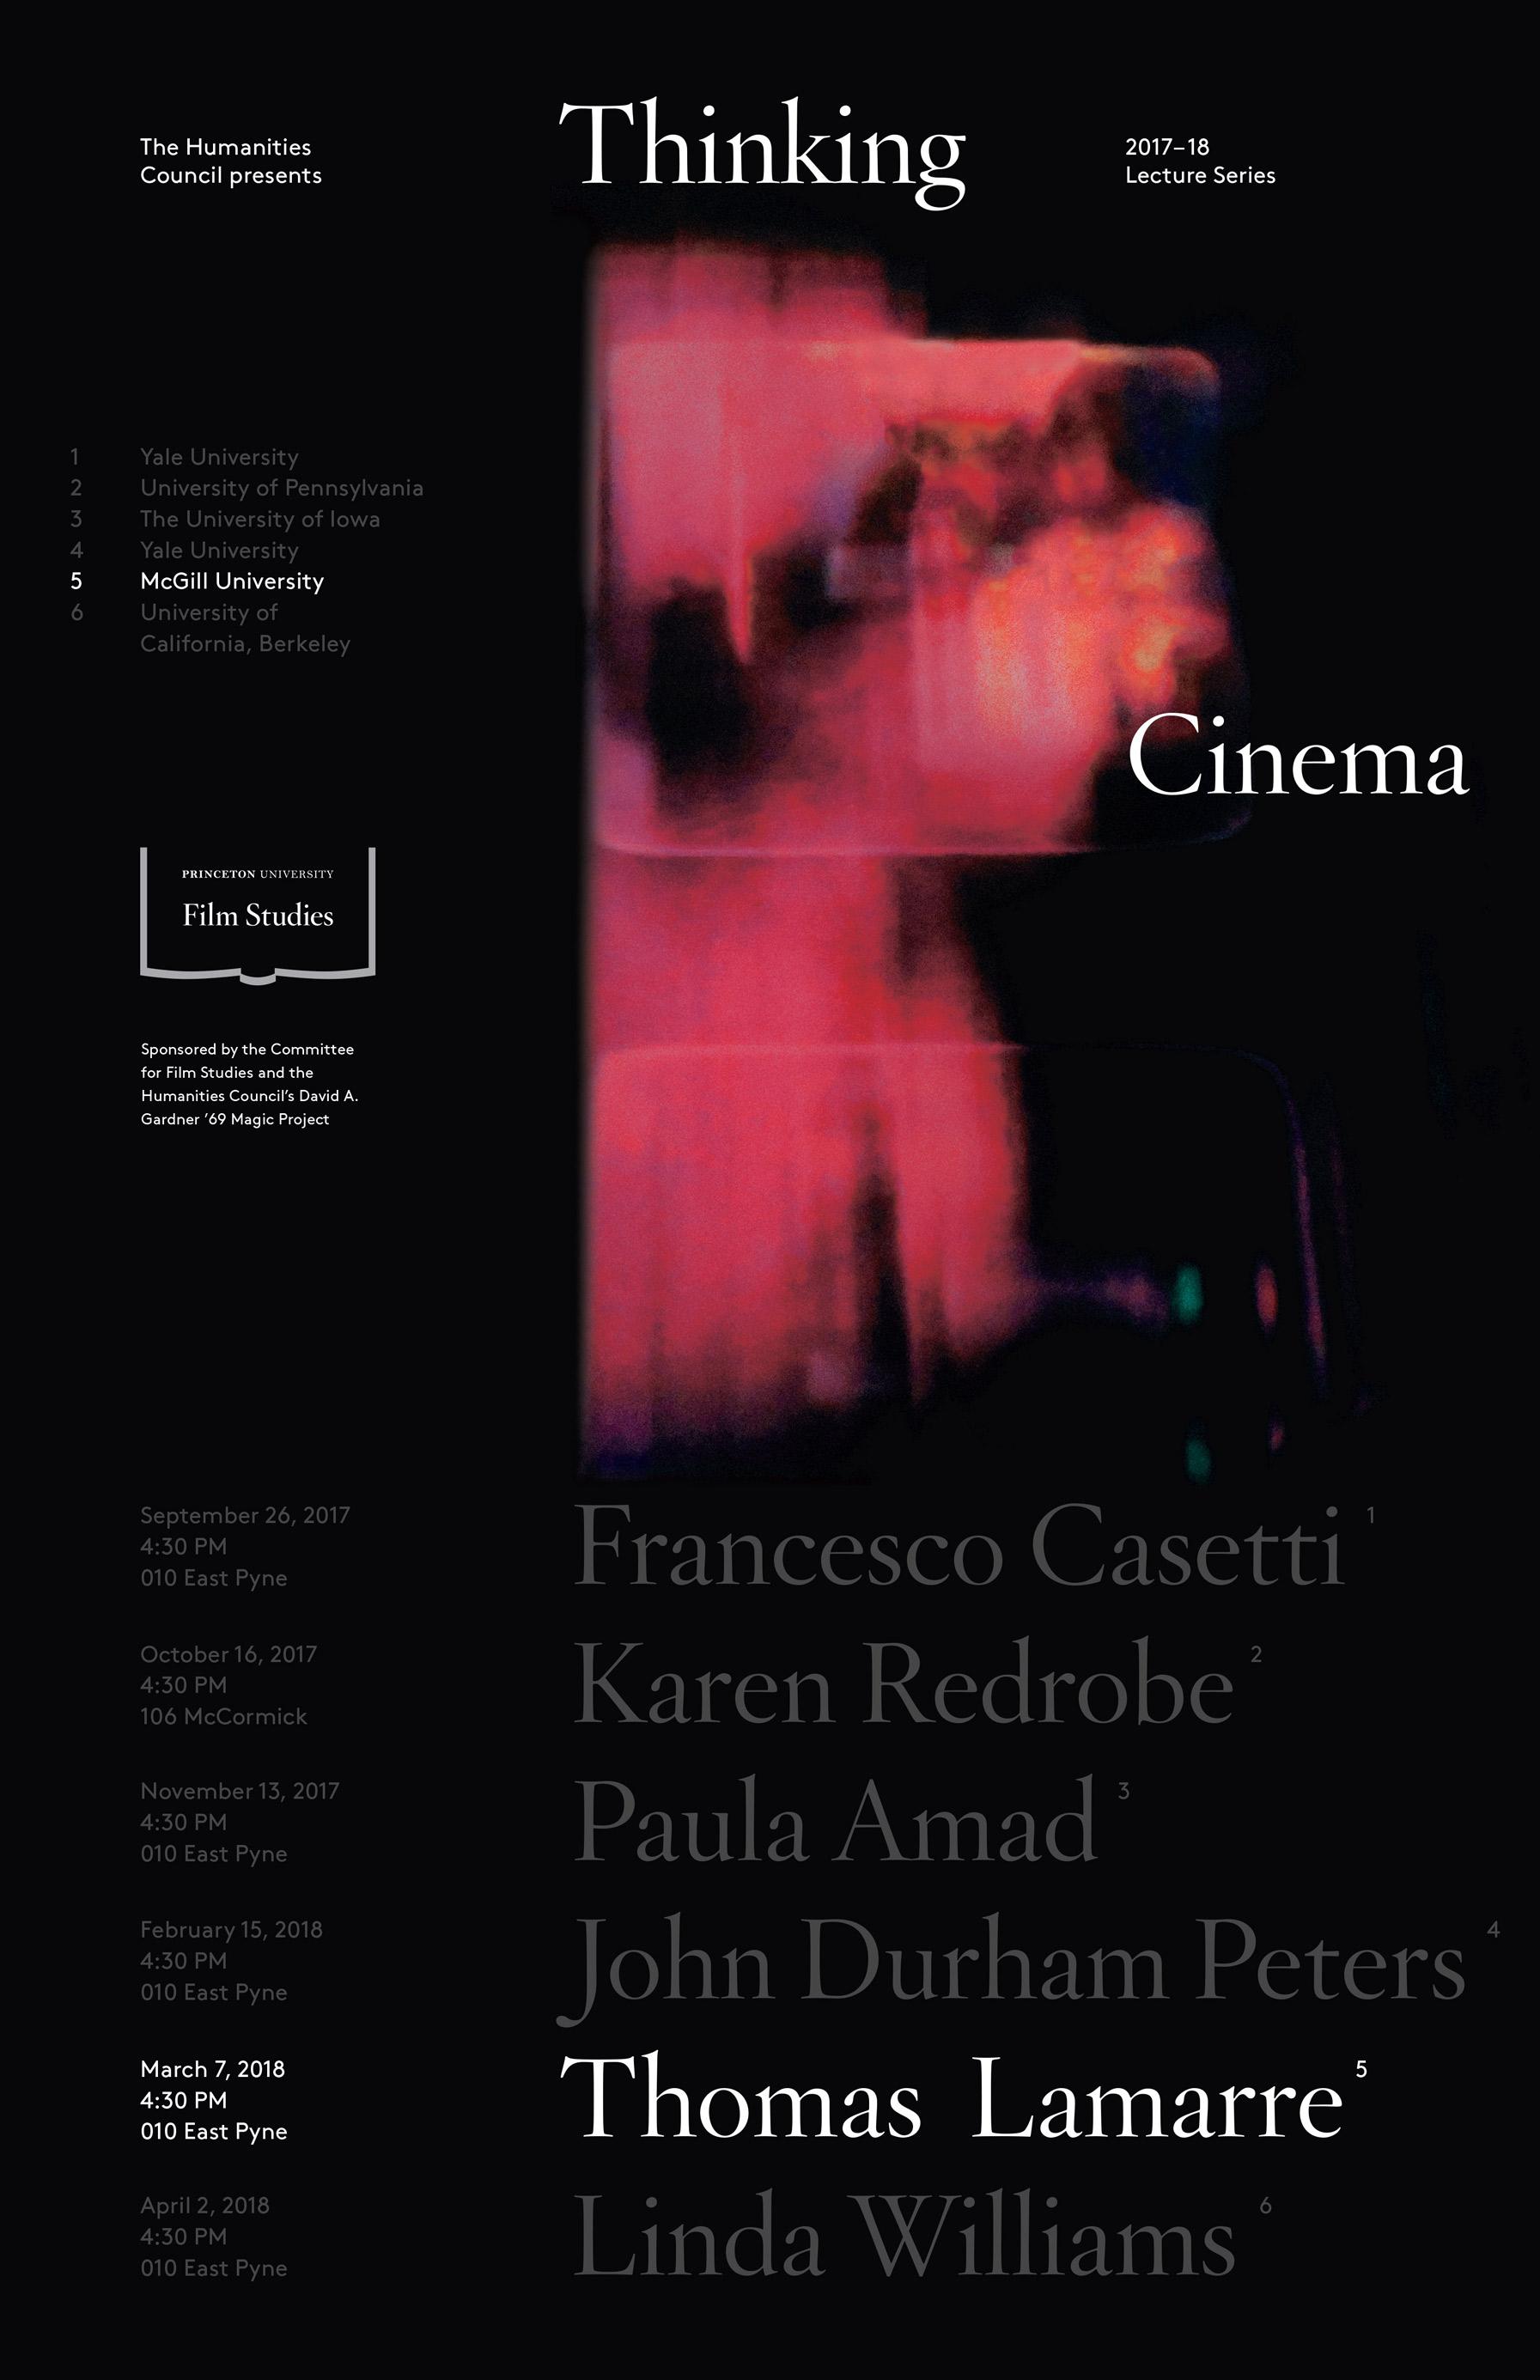 Thinking-Cinema_ac-5.jpg